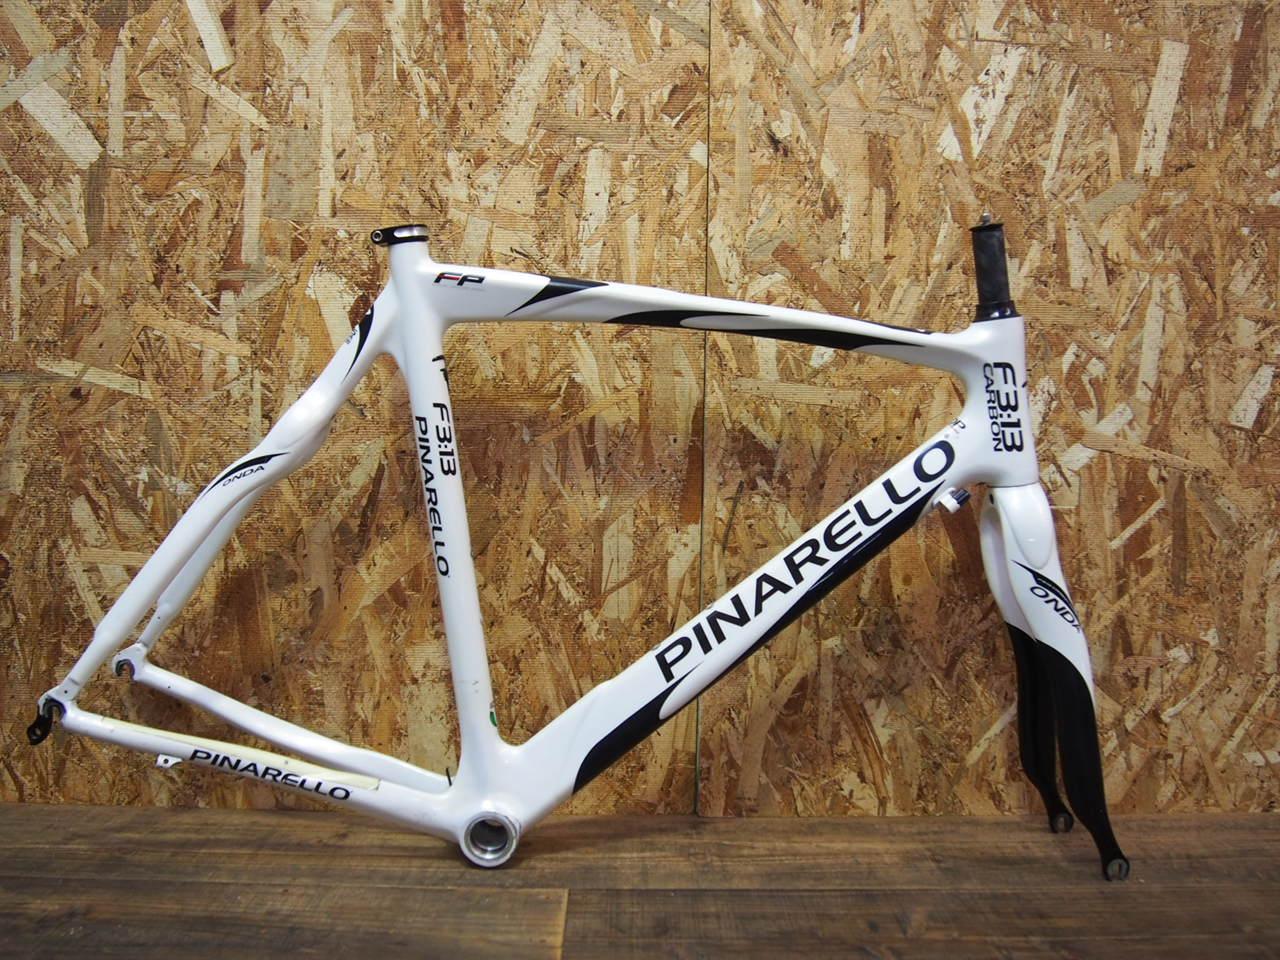 中古自転車 中古自転車 京都 : Frame Set. | 京都の中古自転車 ...